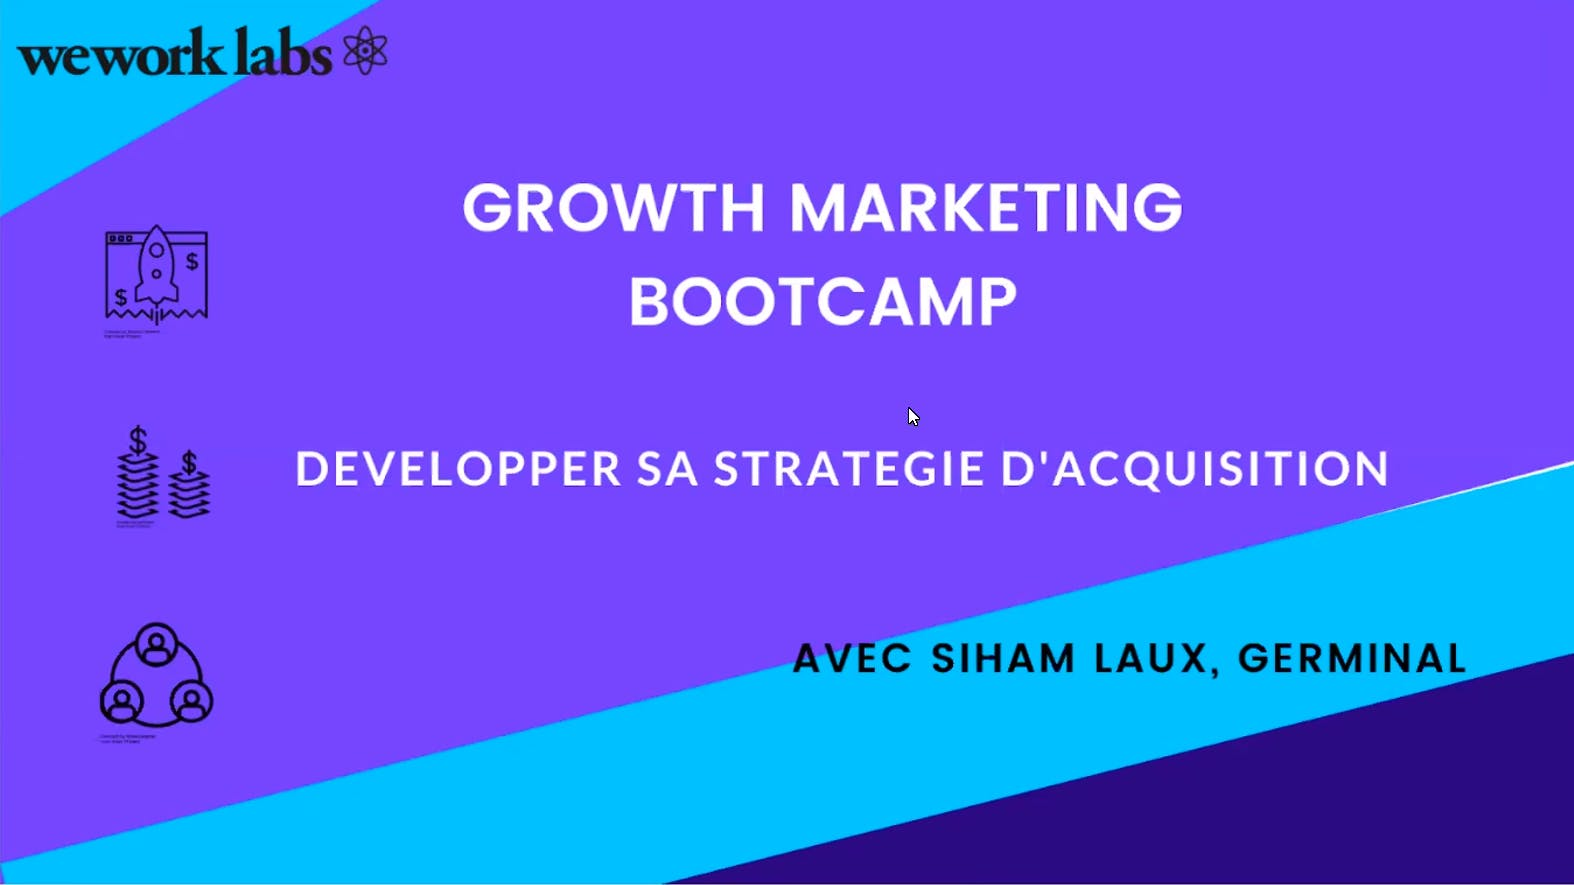 Growth Marketing Bootcamp - Développer sa Stratégie d'Acquisition (4/5)